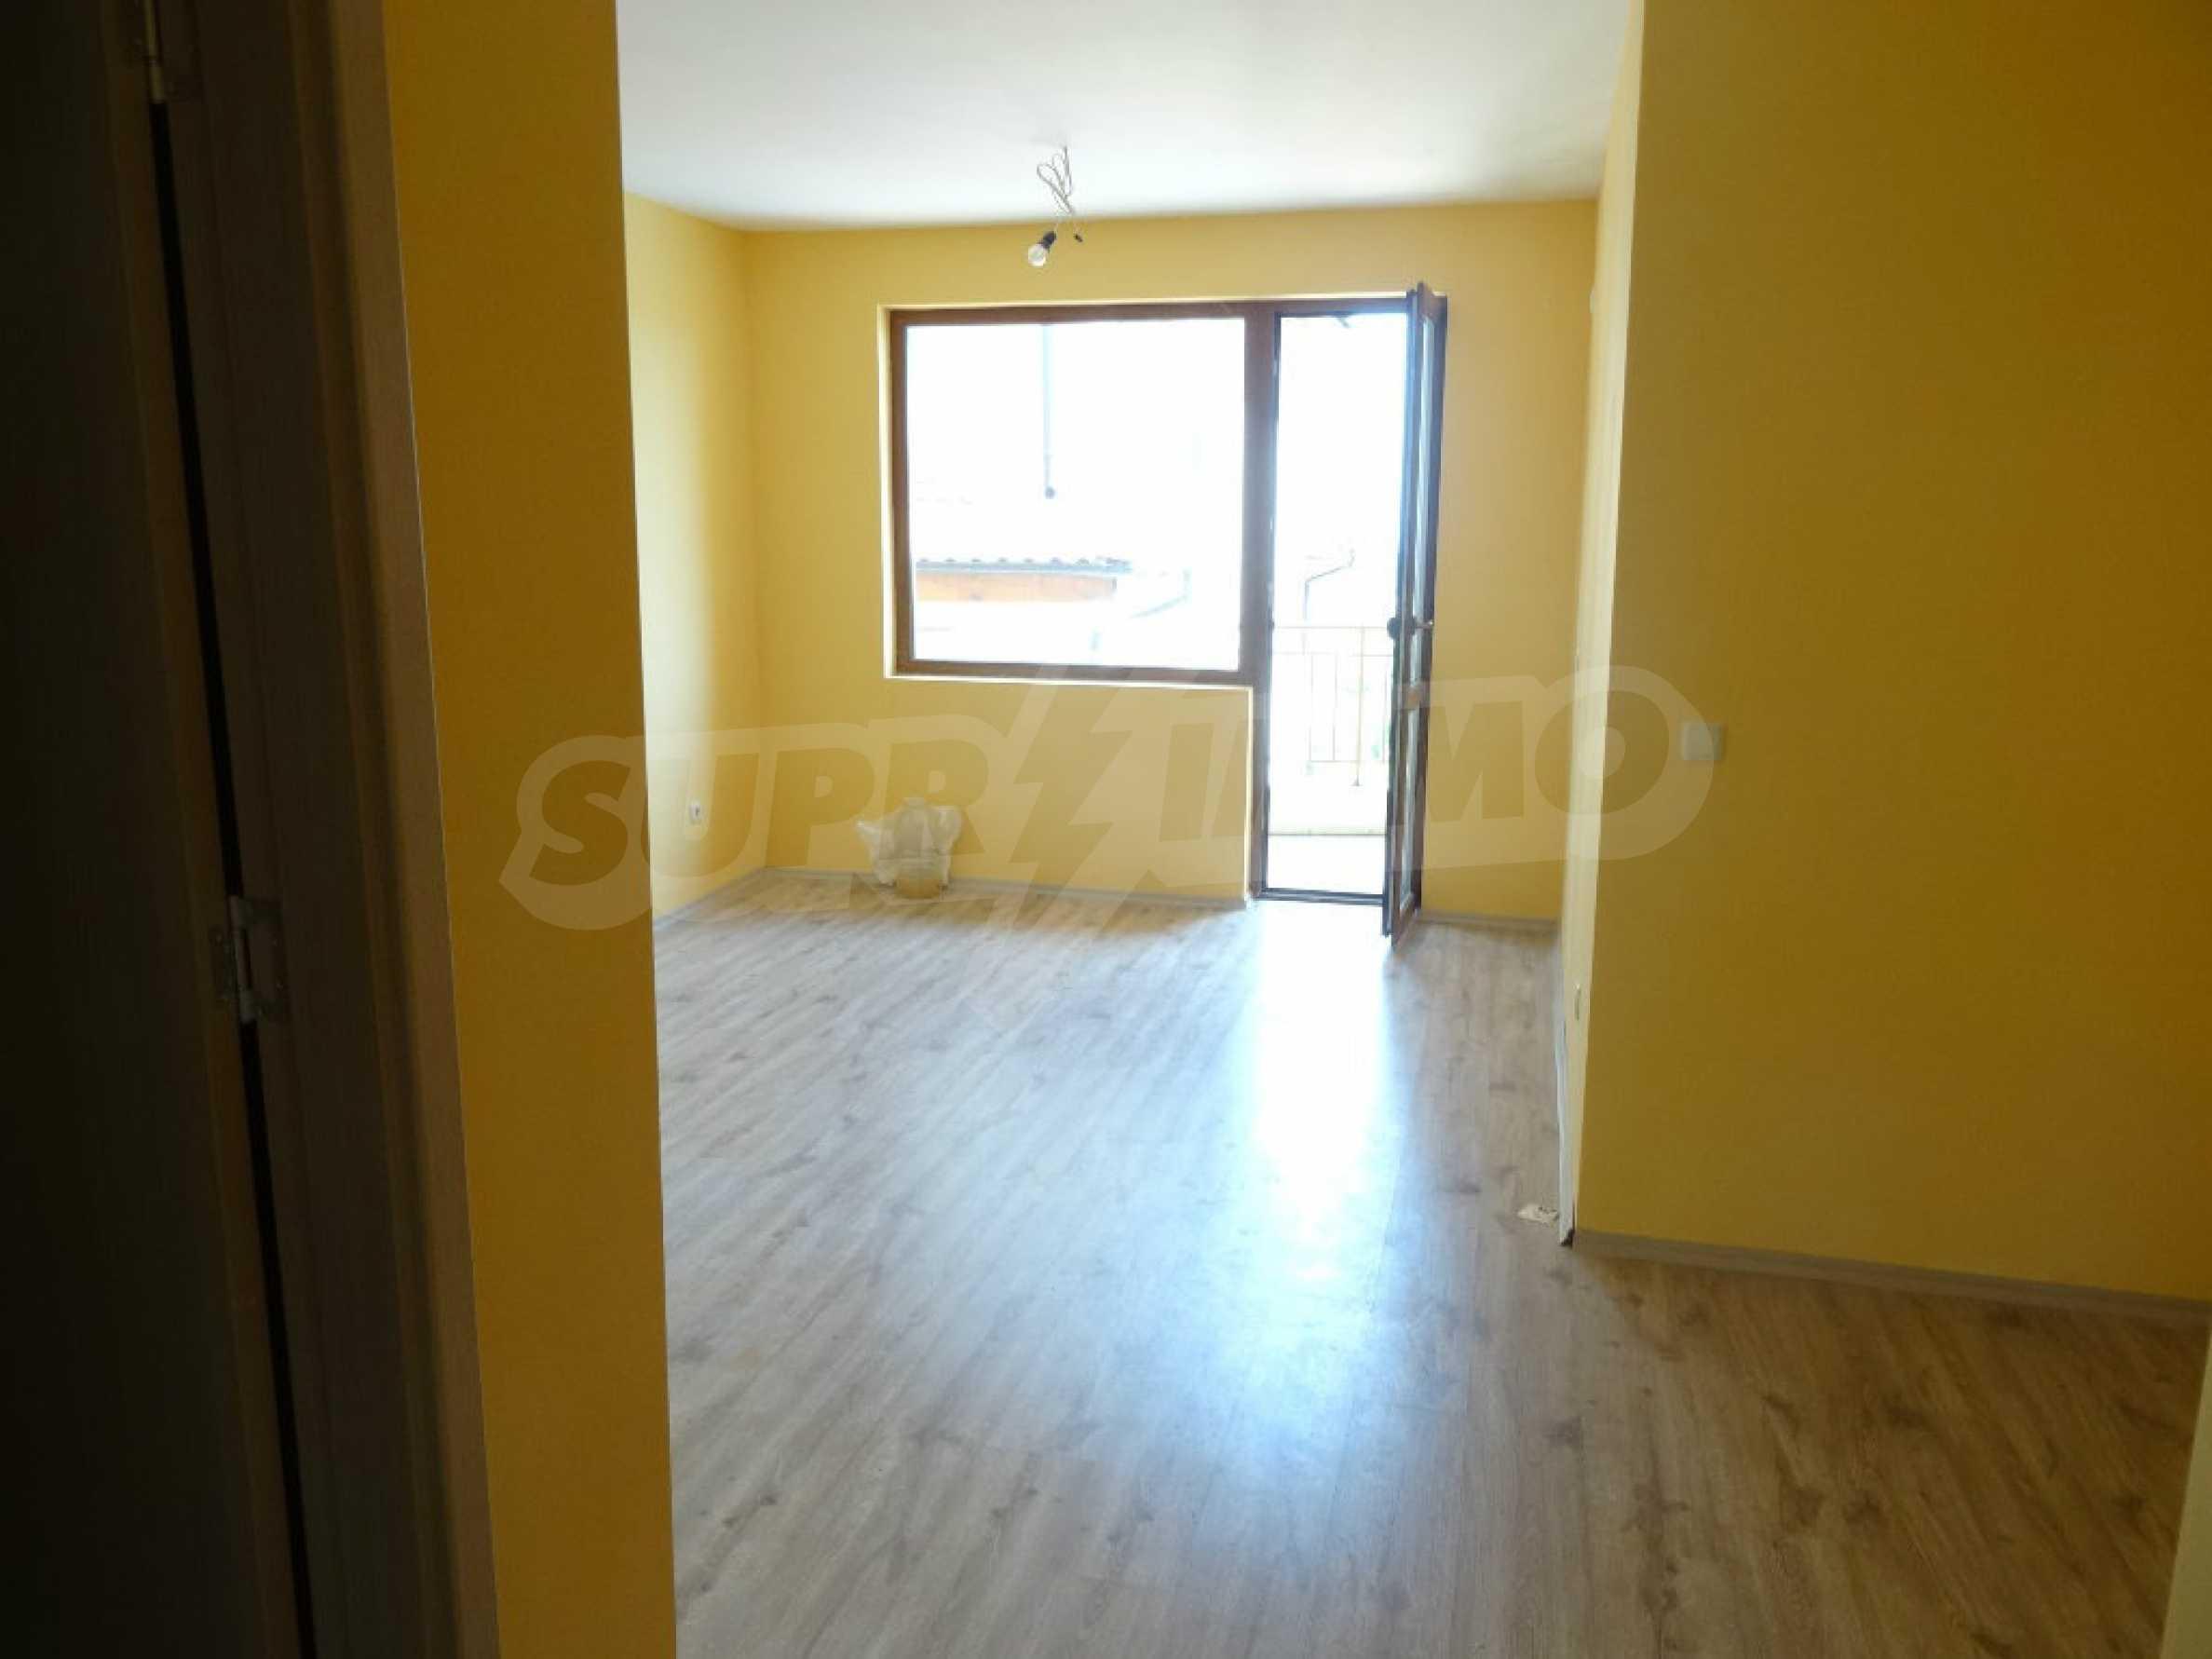 Тристаен апартамент до ключ близо до курорти Албена и Кранево 2